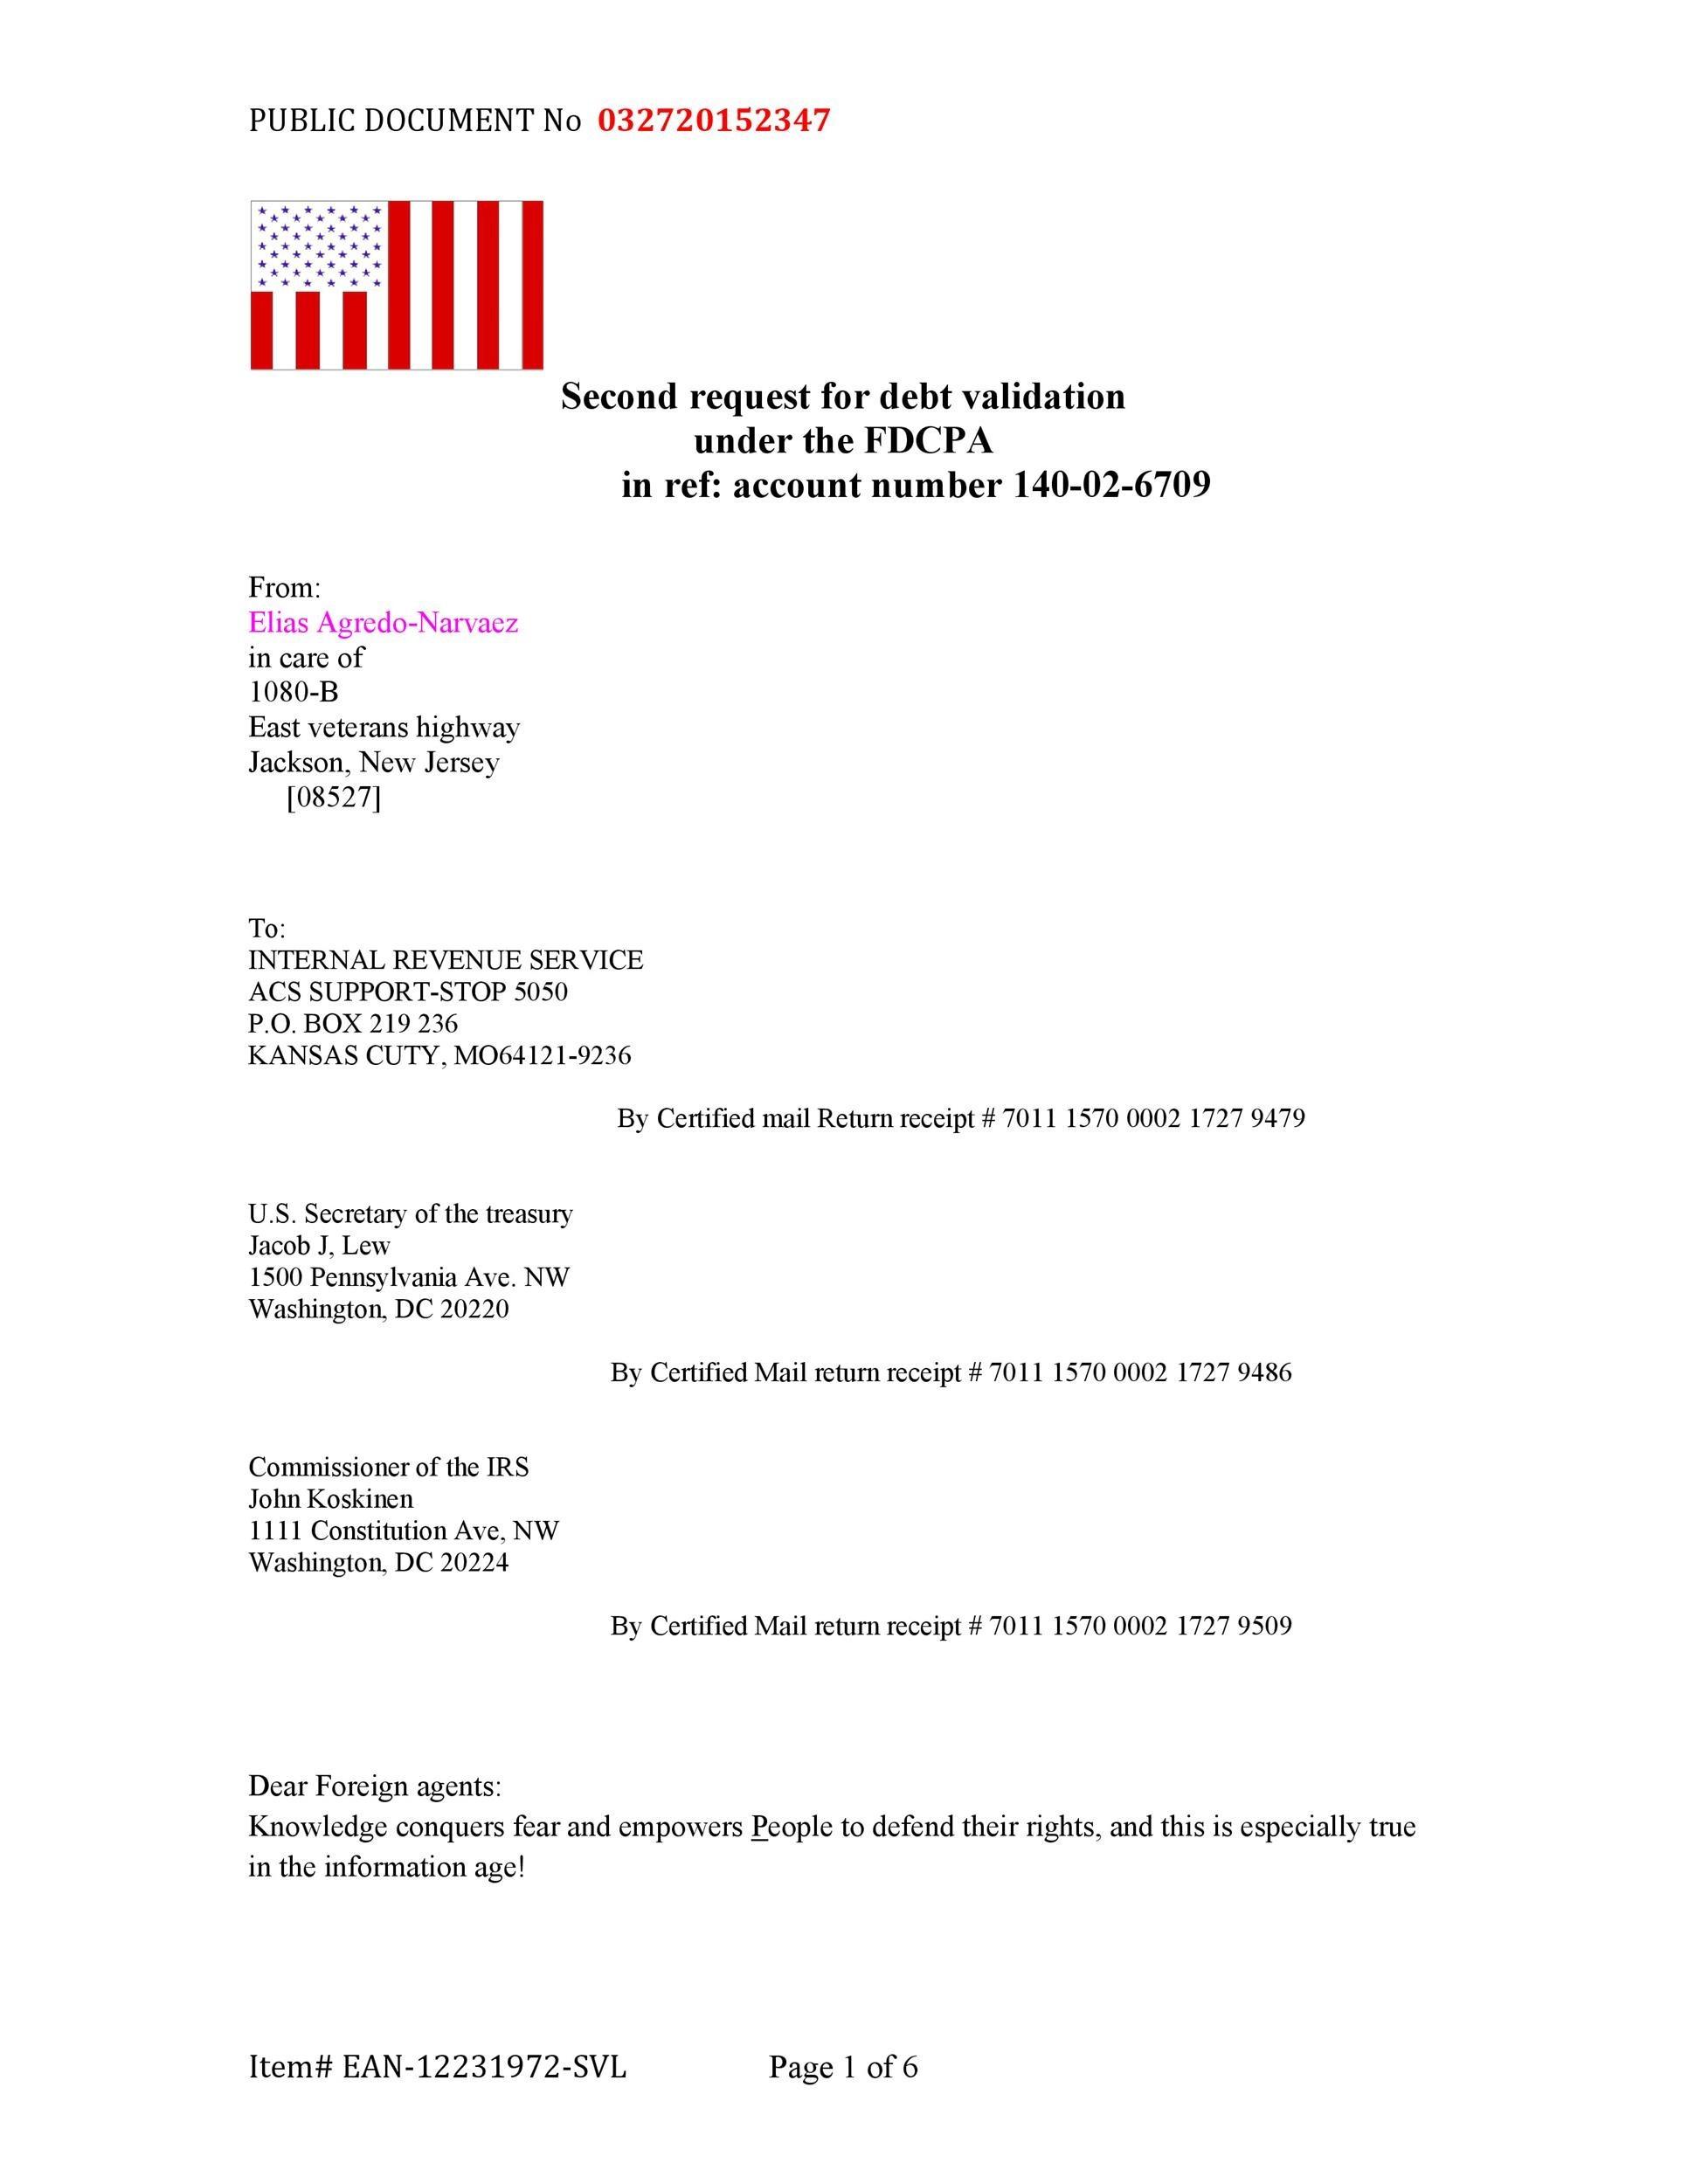 Free debt validation letter 49